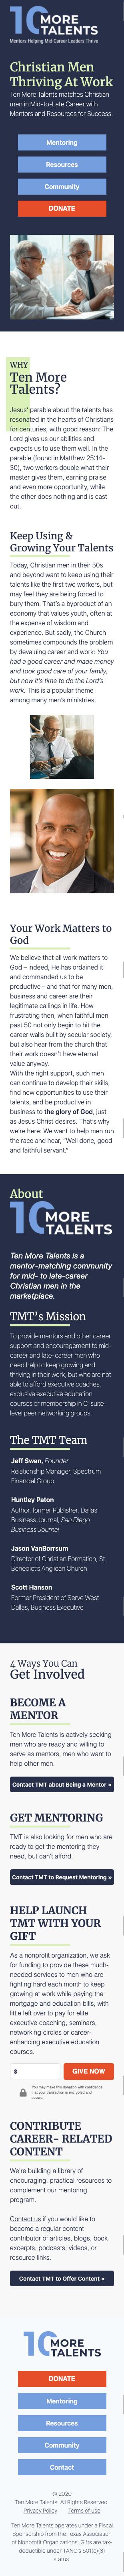 10 More Talents - Website Mobile